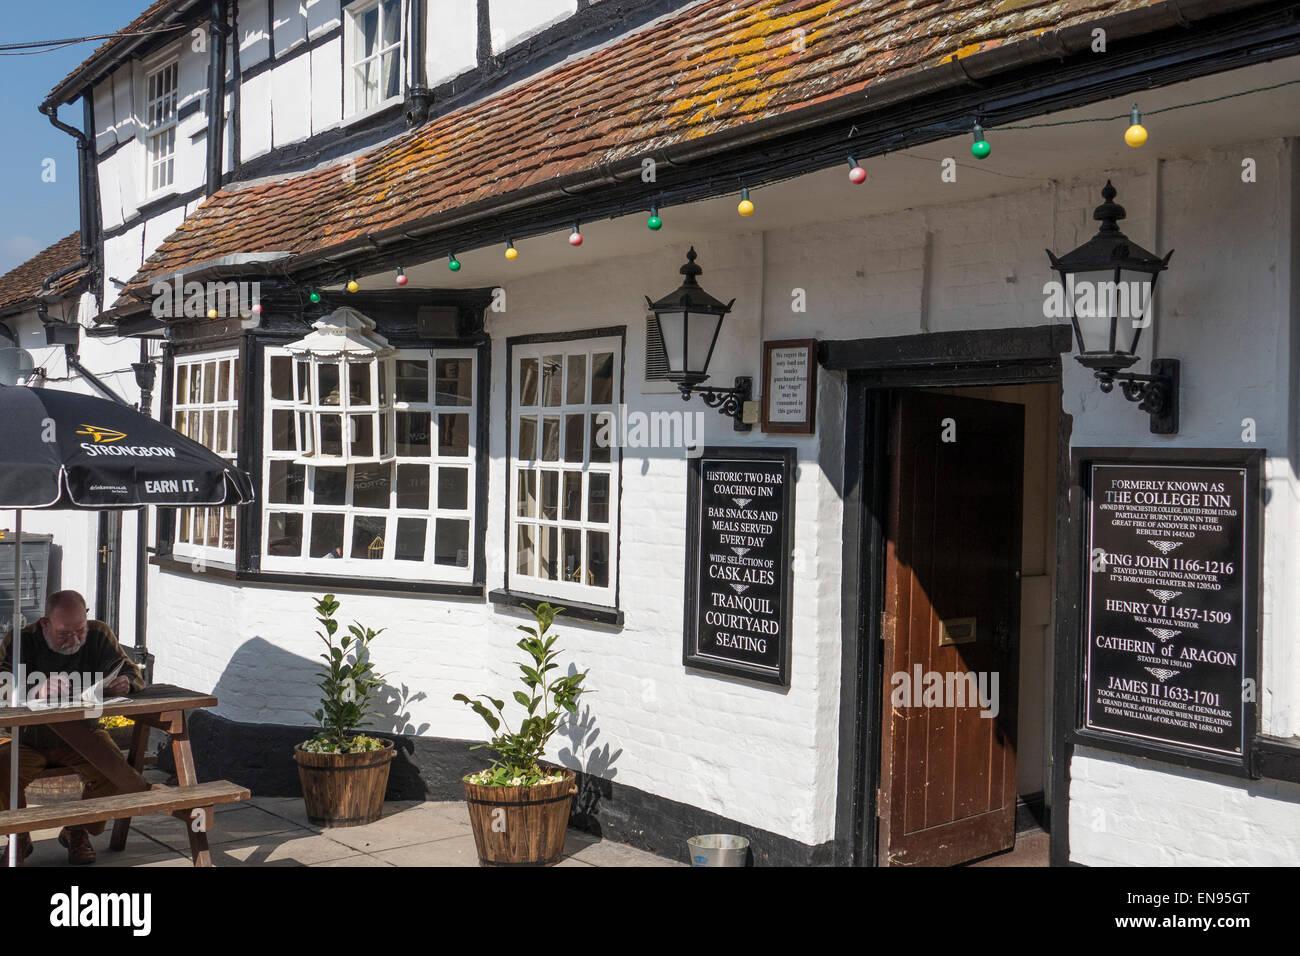 England, Hampshire, Andover, Angel Inn - Stock Image